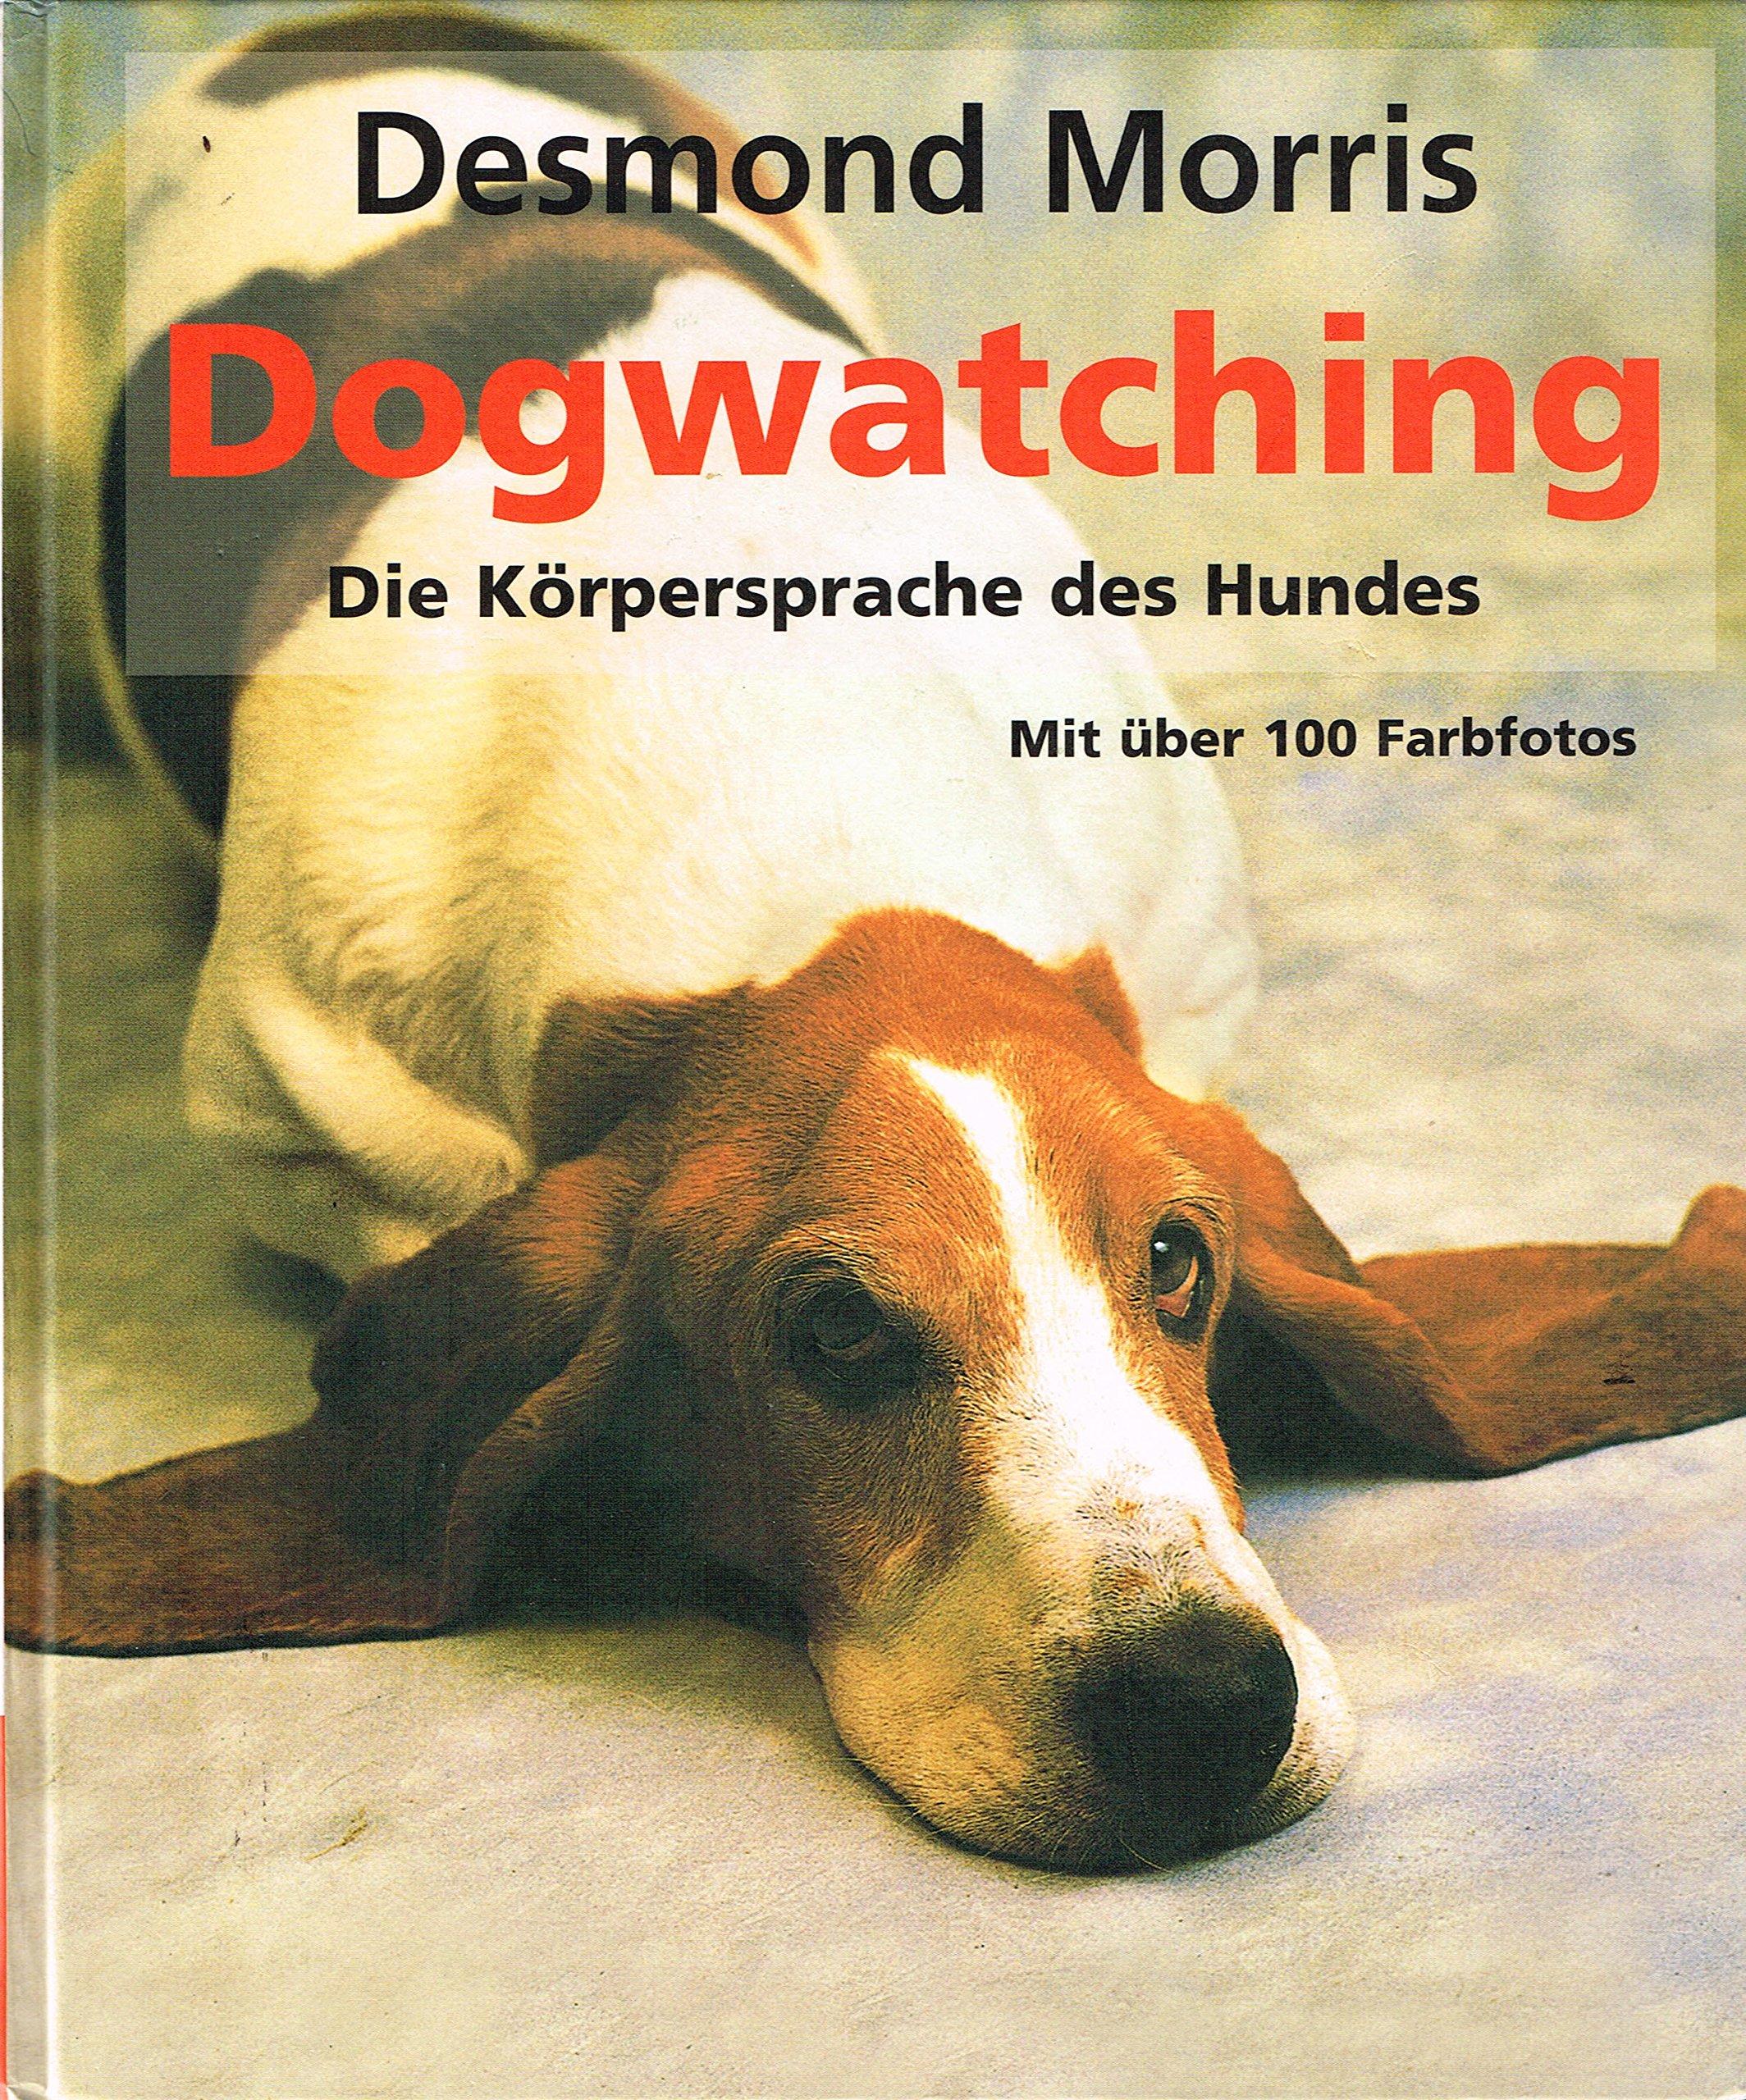 Dogwatching. Die Körpersprache des Hundes.